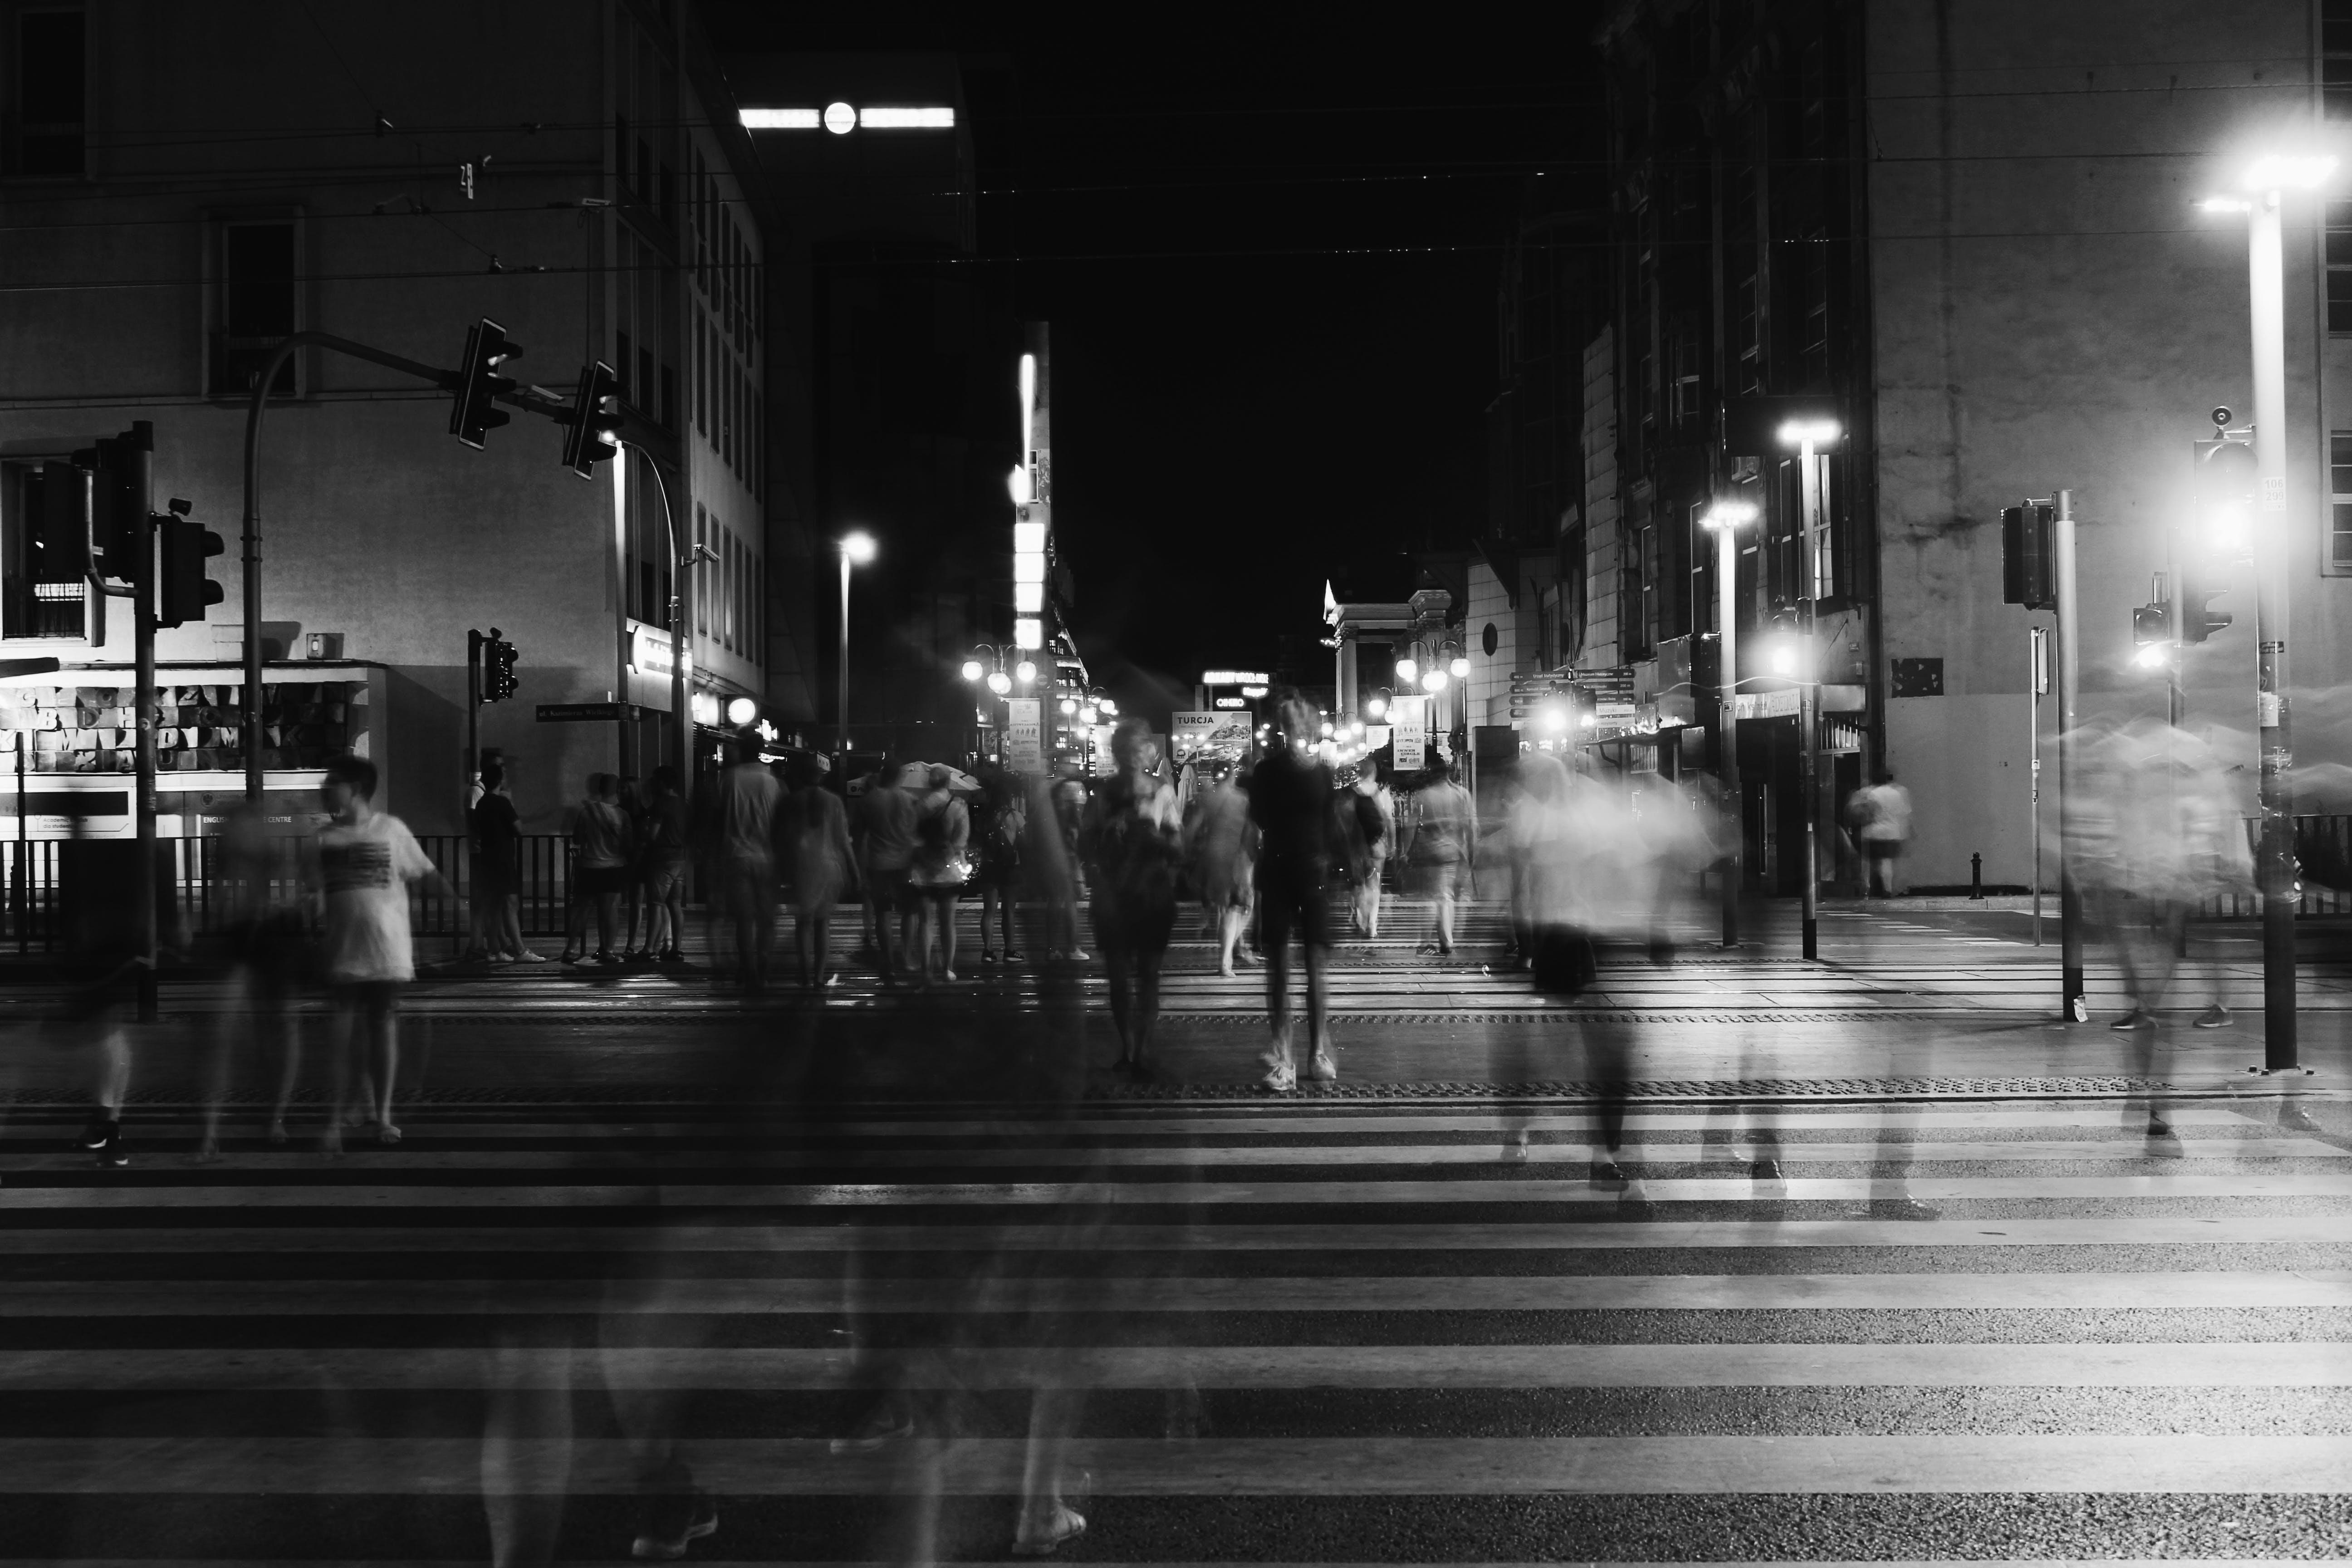 Group of People Crossing Pedestrian Lane in Greyscale